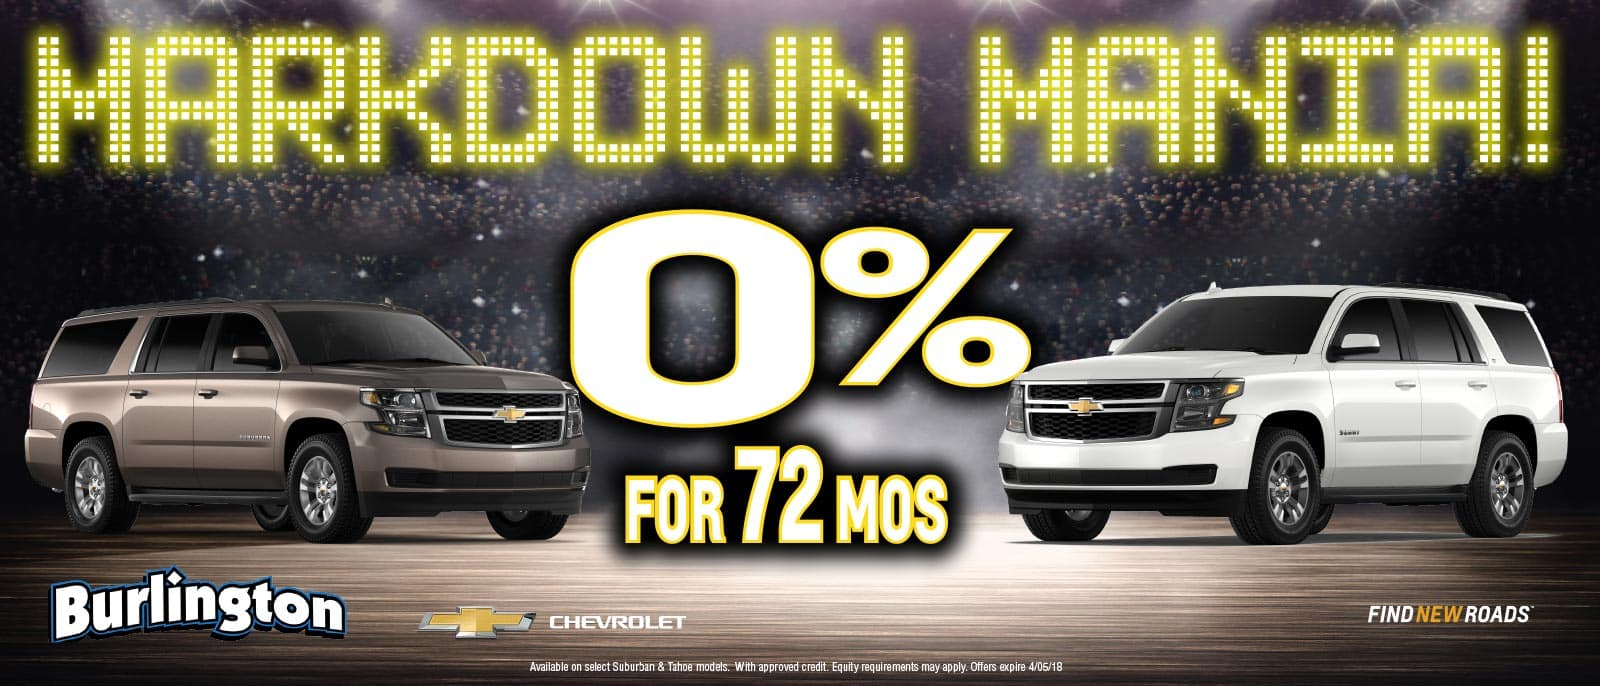 Burlington Chevrolet | Chevrolet Dealer in South Burlington, NJ